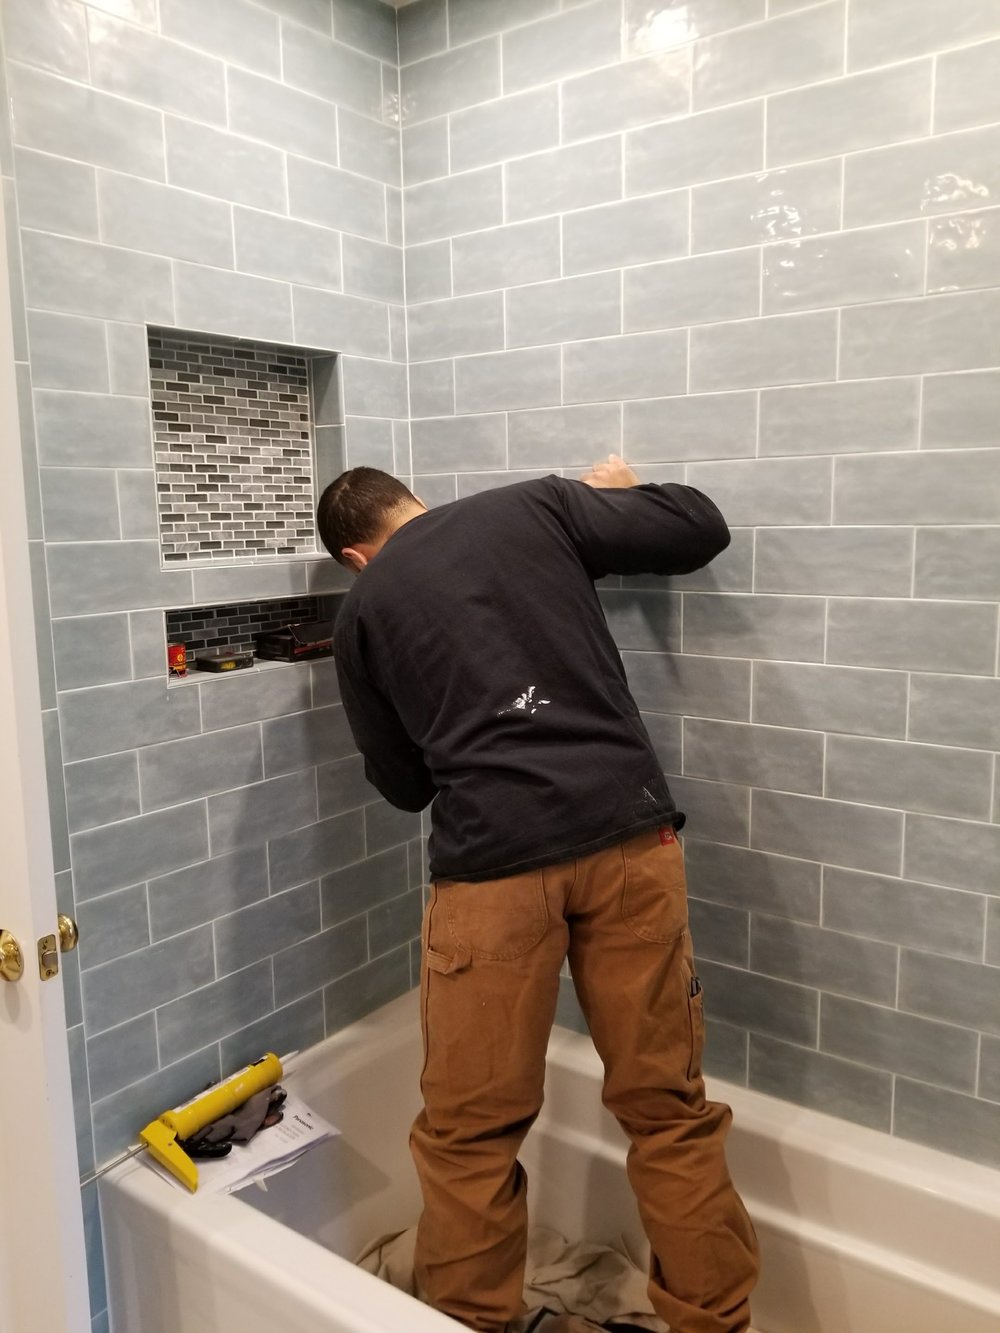 Shaw Remodeling - Progress photo - Bathroom Remodel in East Lyme CT  (7).jpg